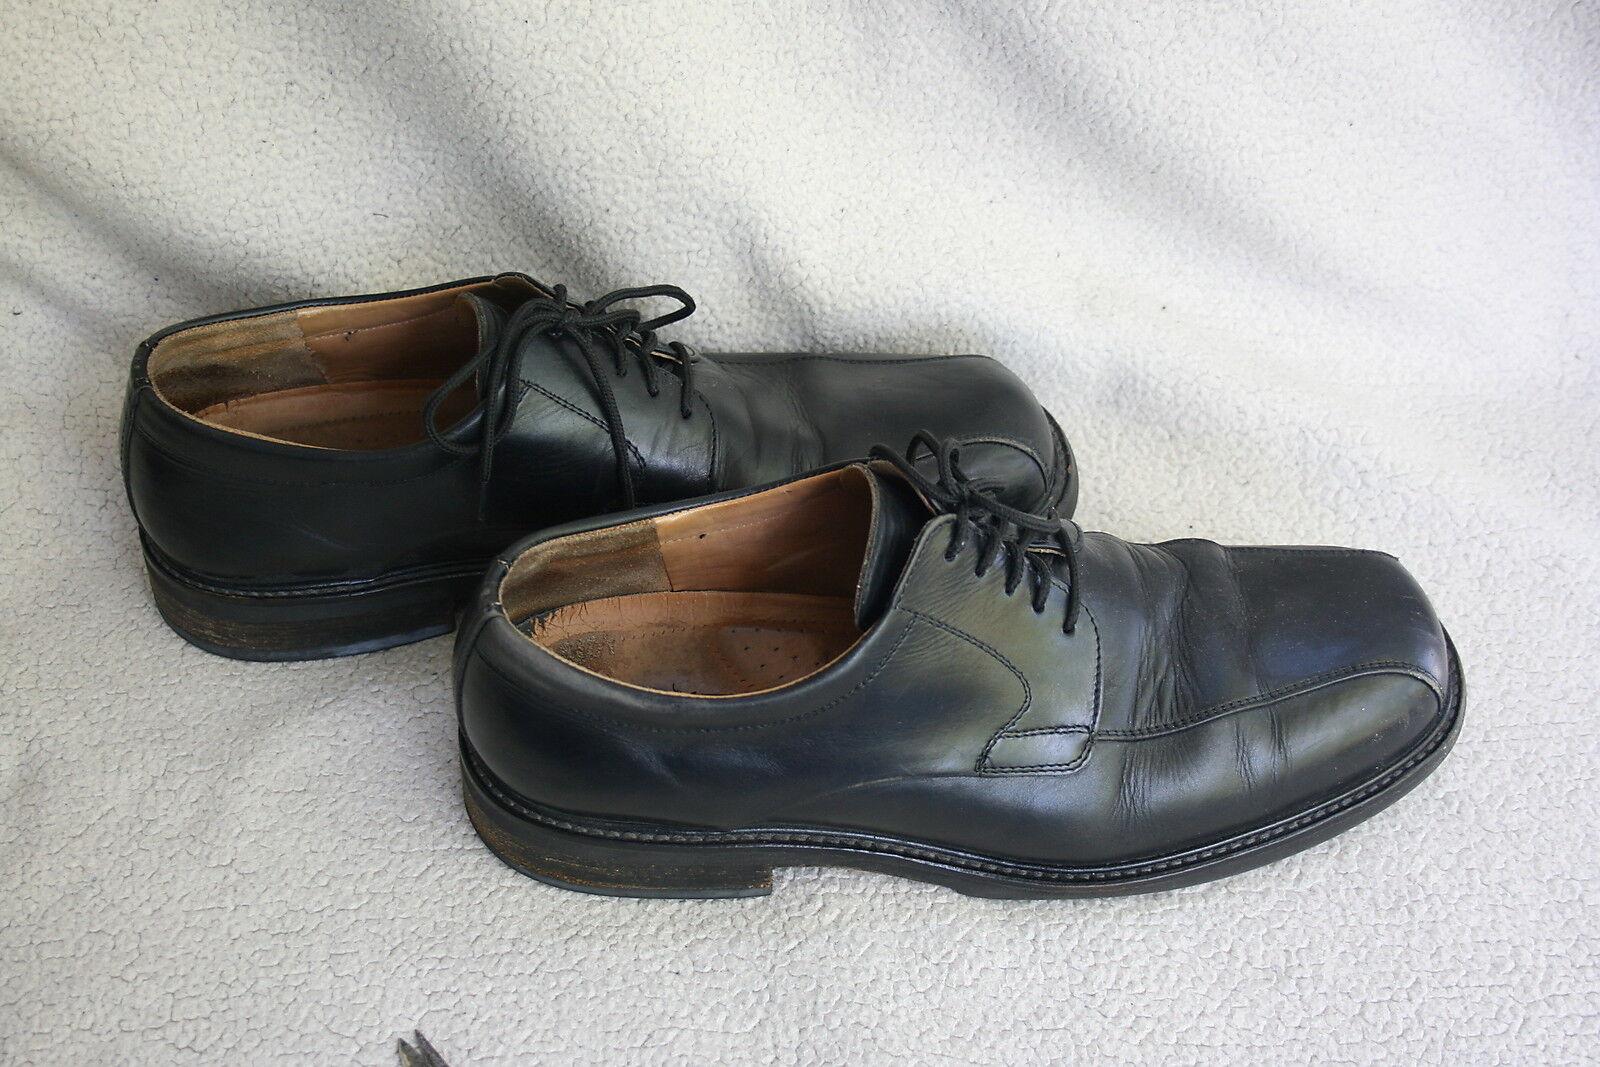 Lloyd Business Schuhe Halb Gr.46,5 schwarz